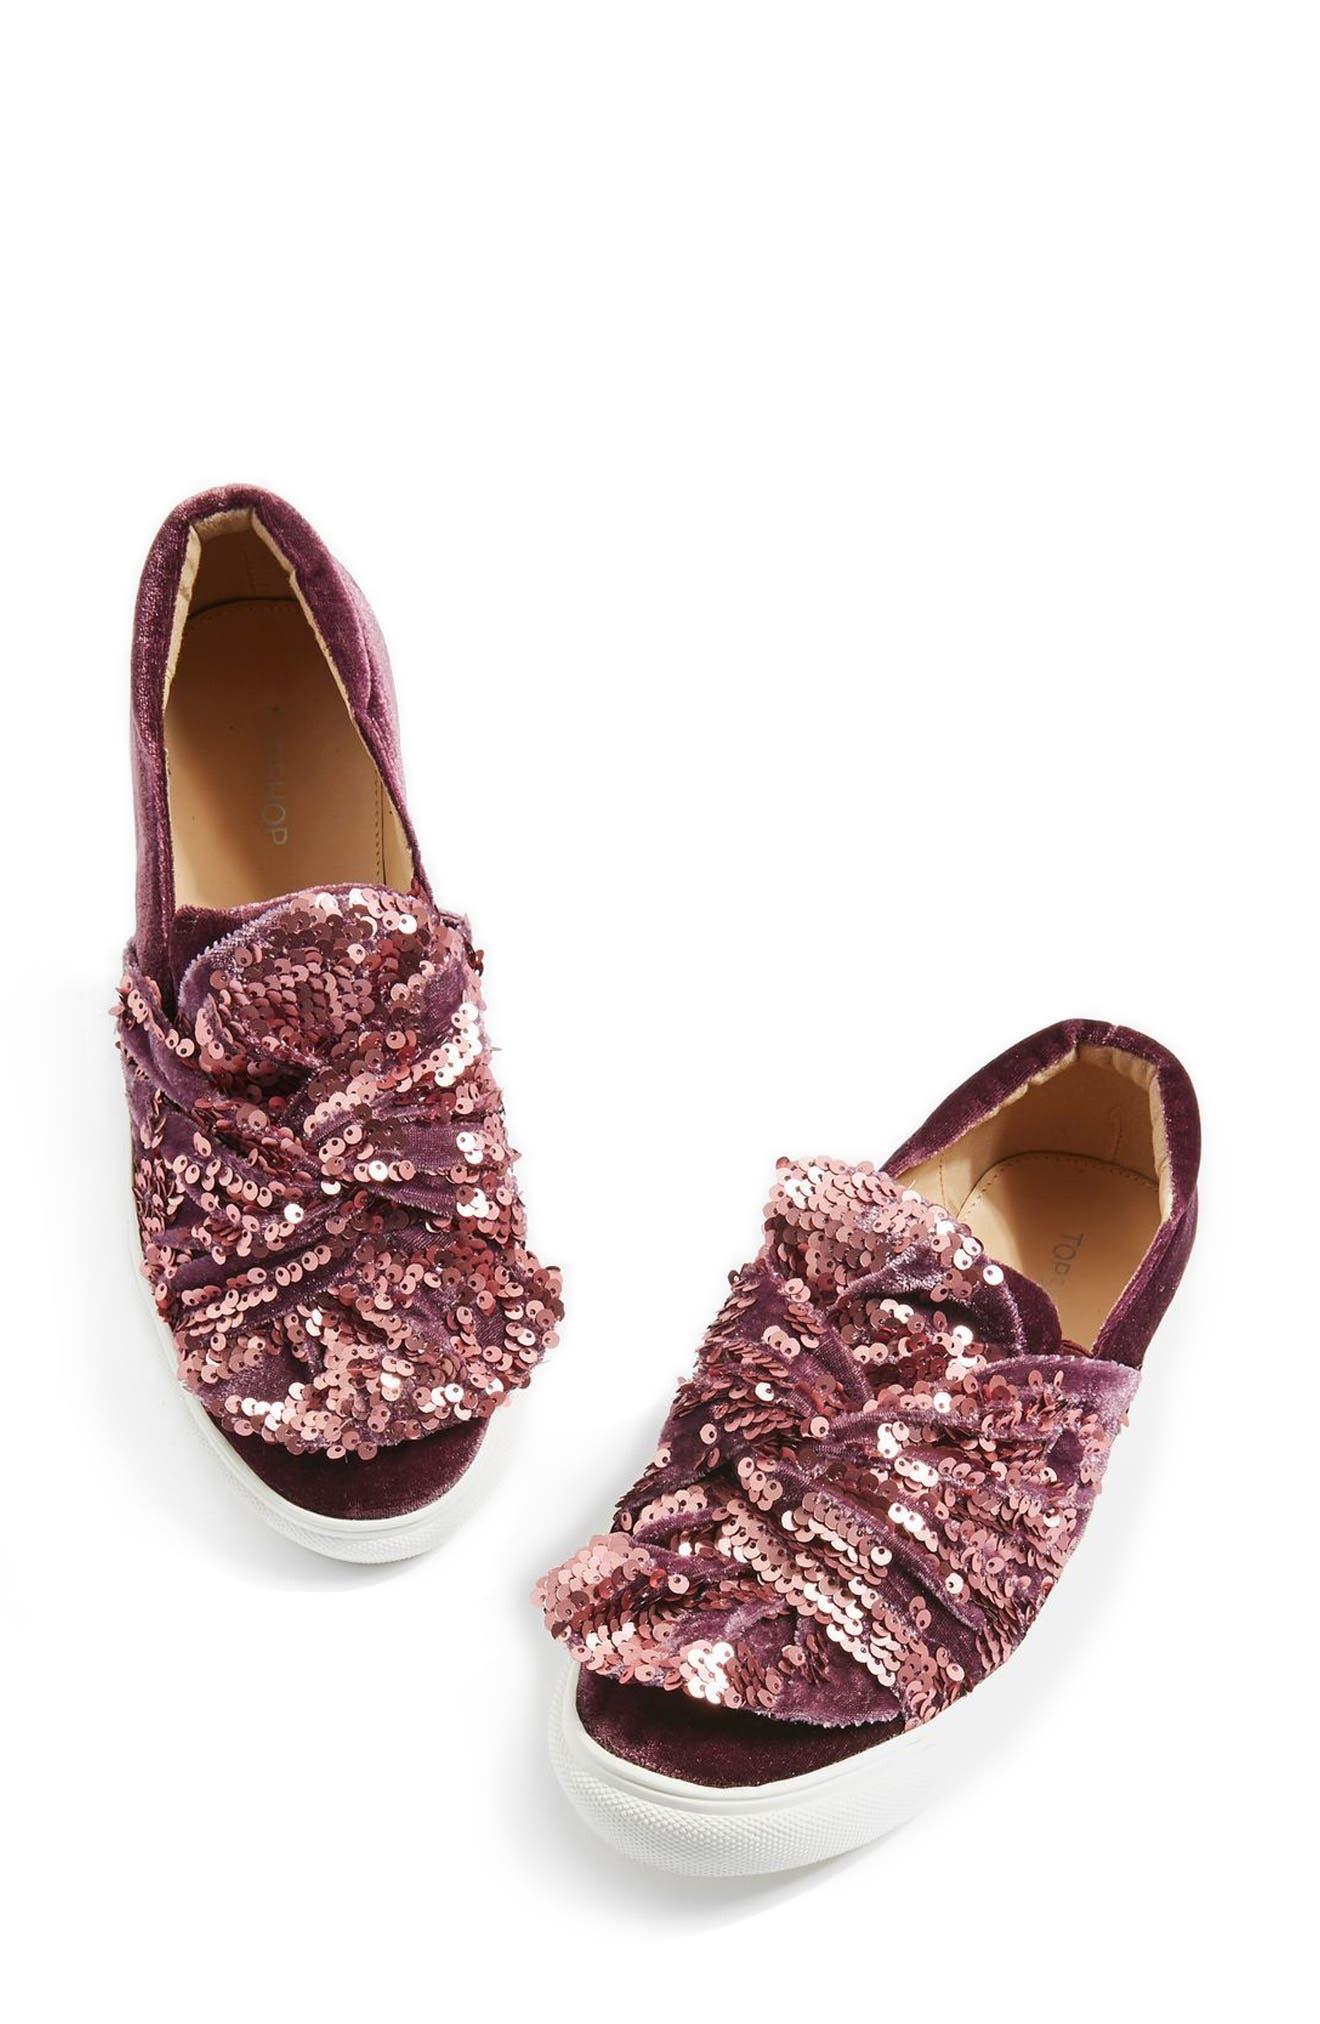 Alternate Image 1 Selected - Topshop Twisted Sequin Velvet Sneakers